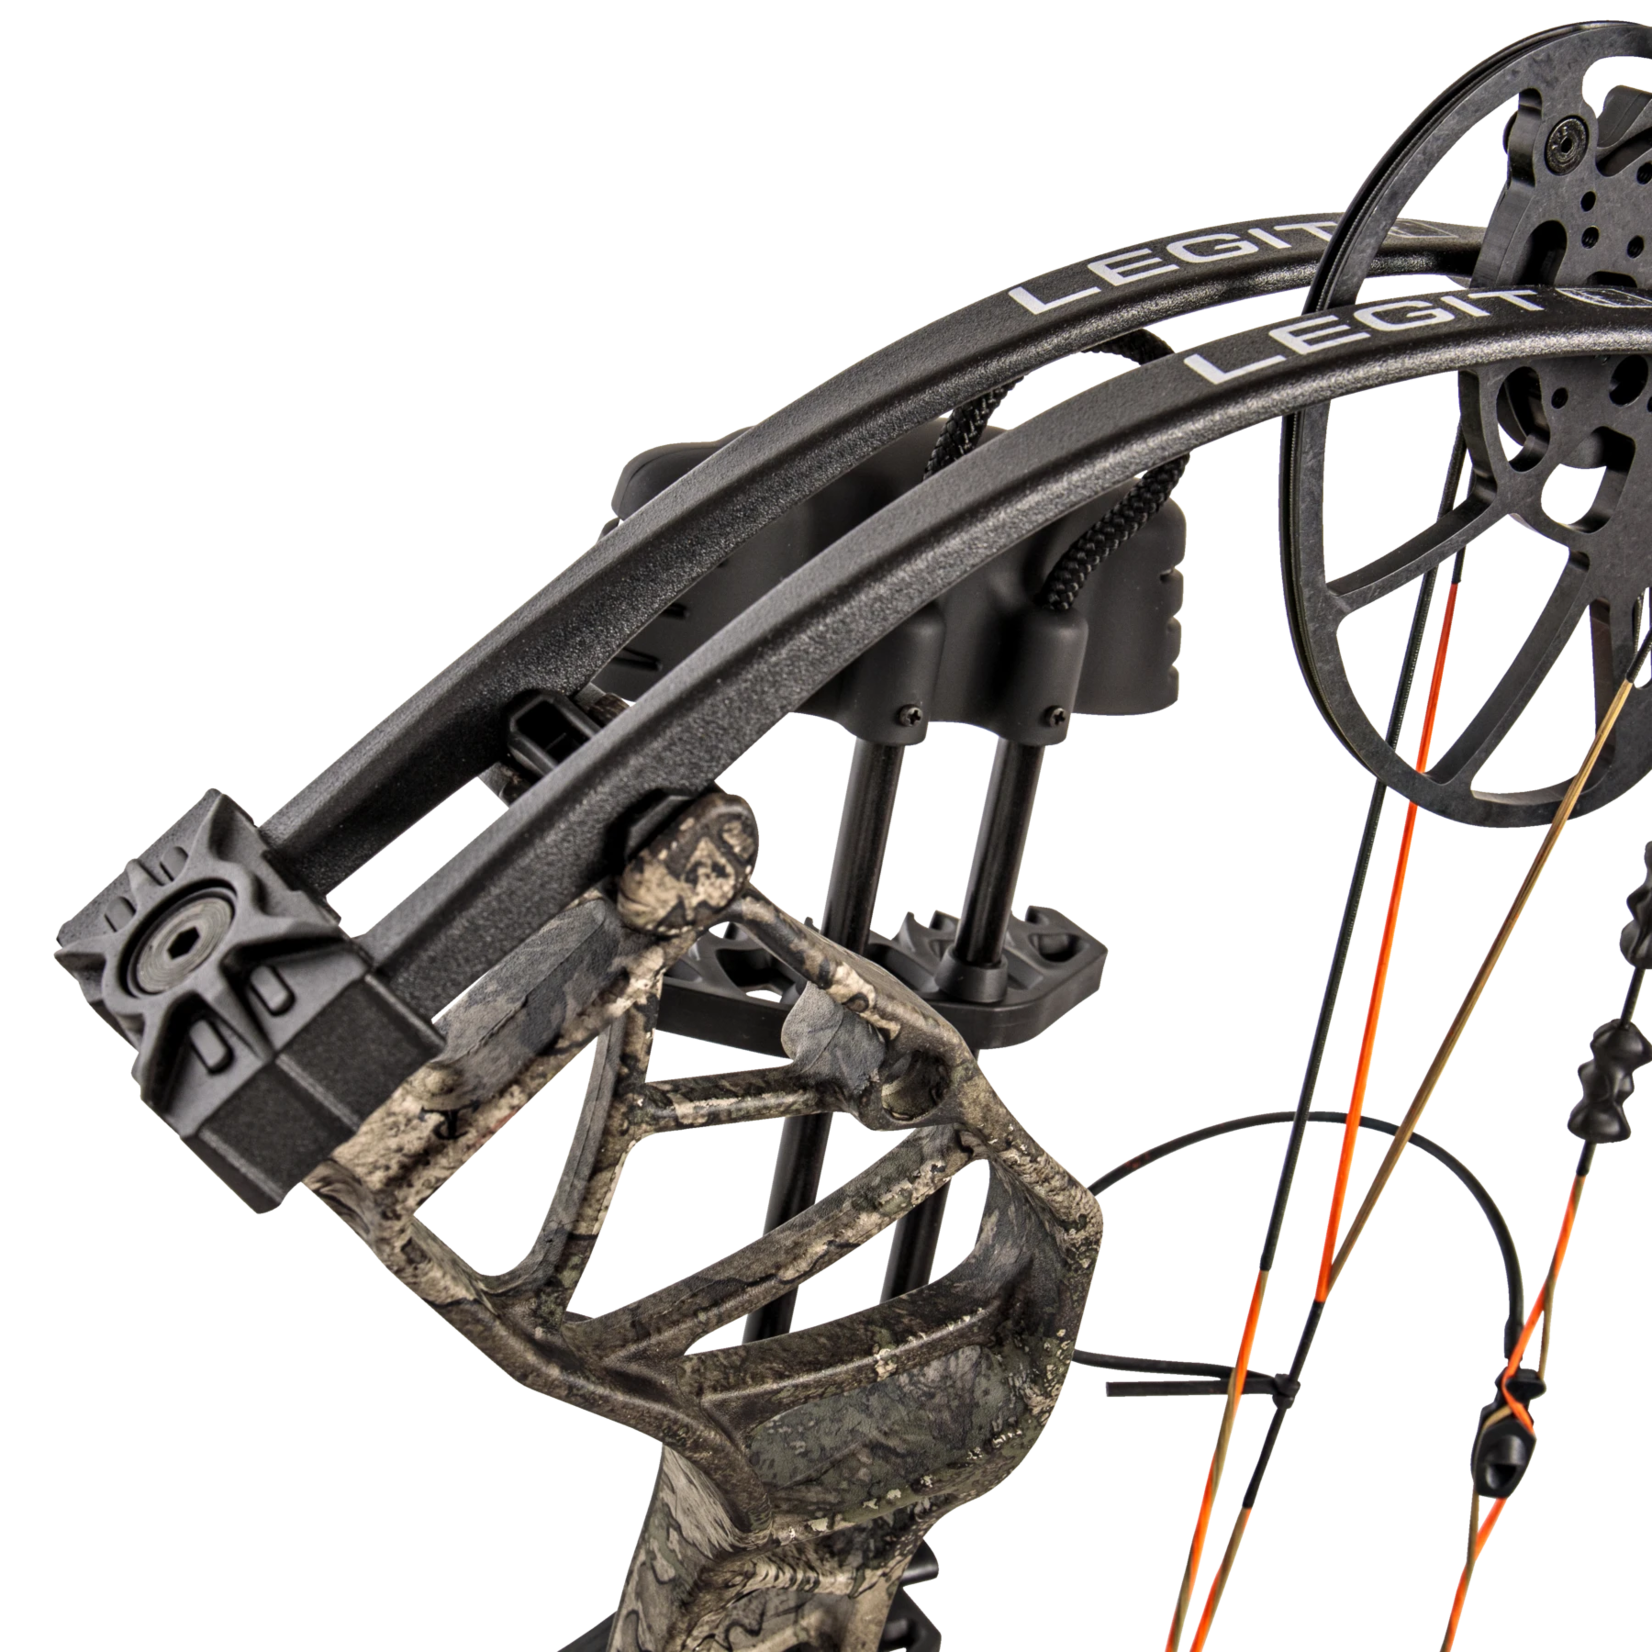 Bear Archery Legit RTH True Timber Strata - Right Handed